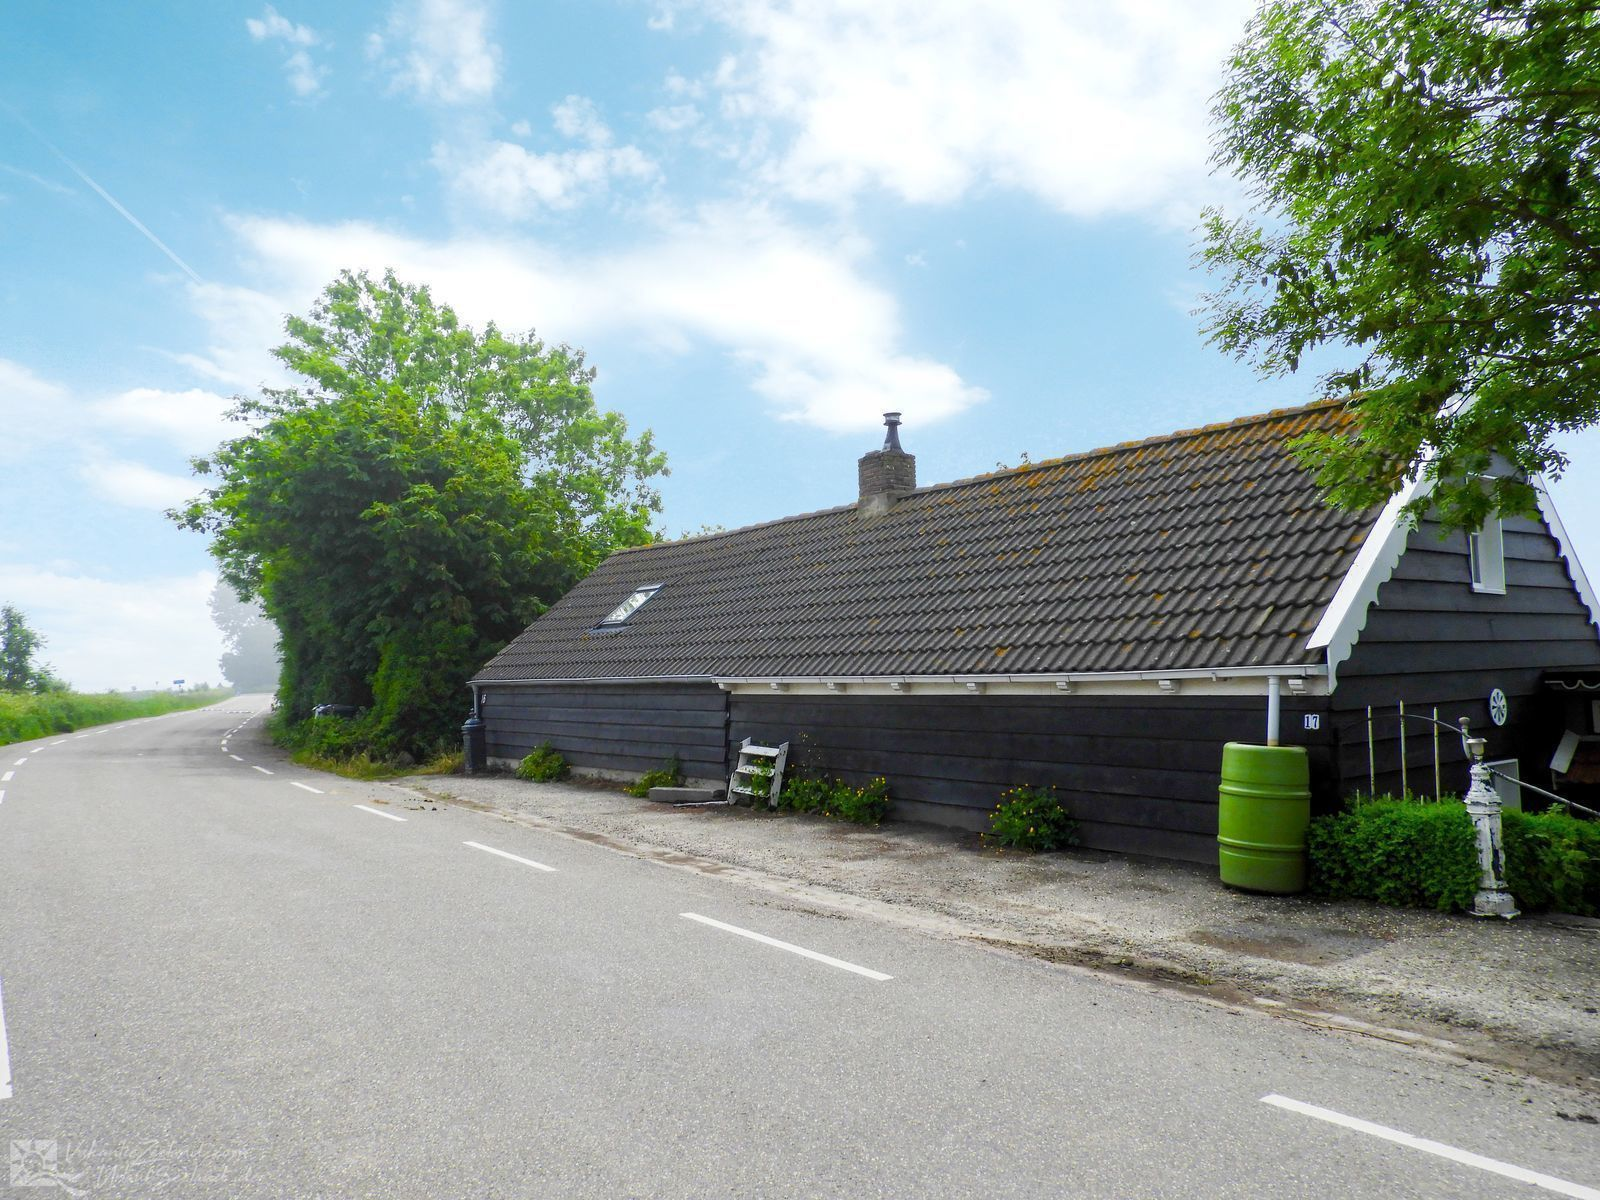 VZ184 Ferienhaus in Kamperland